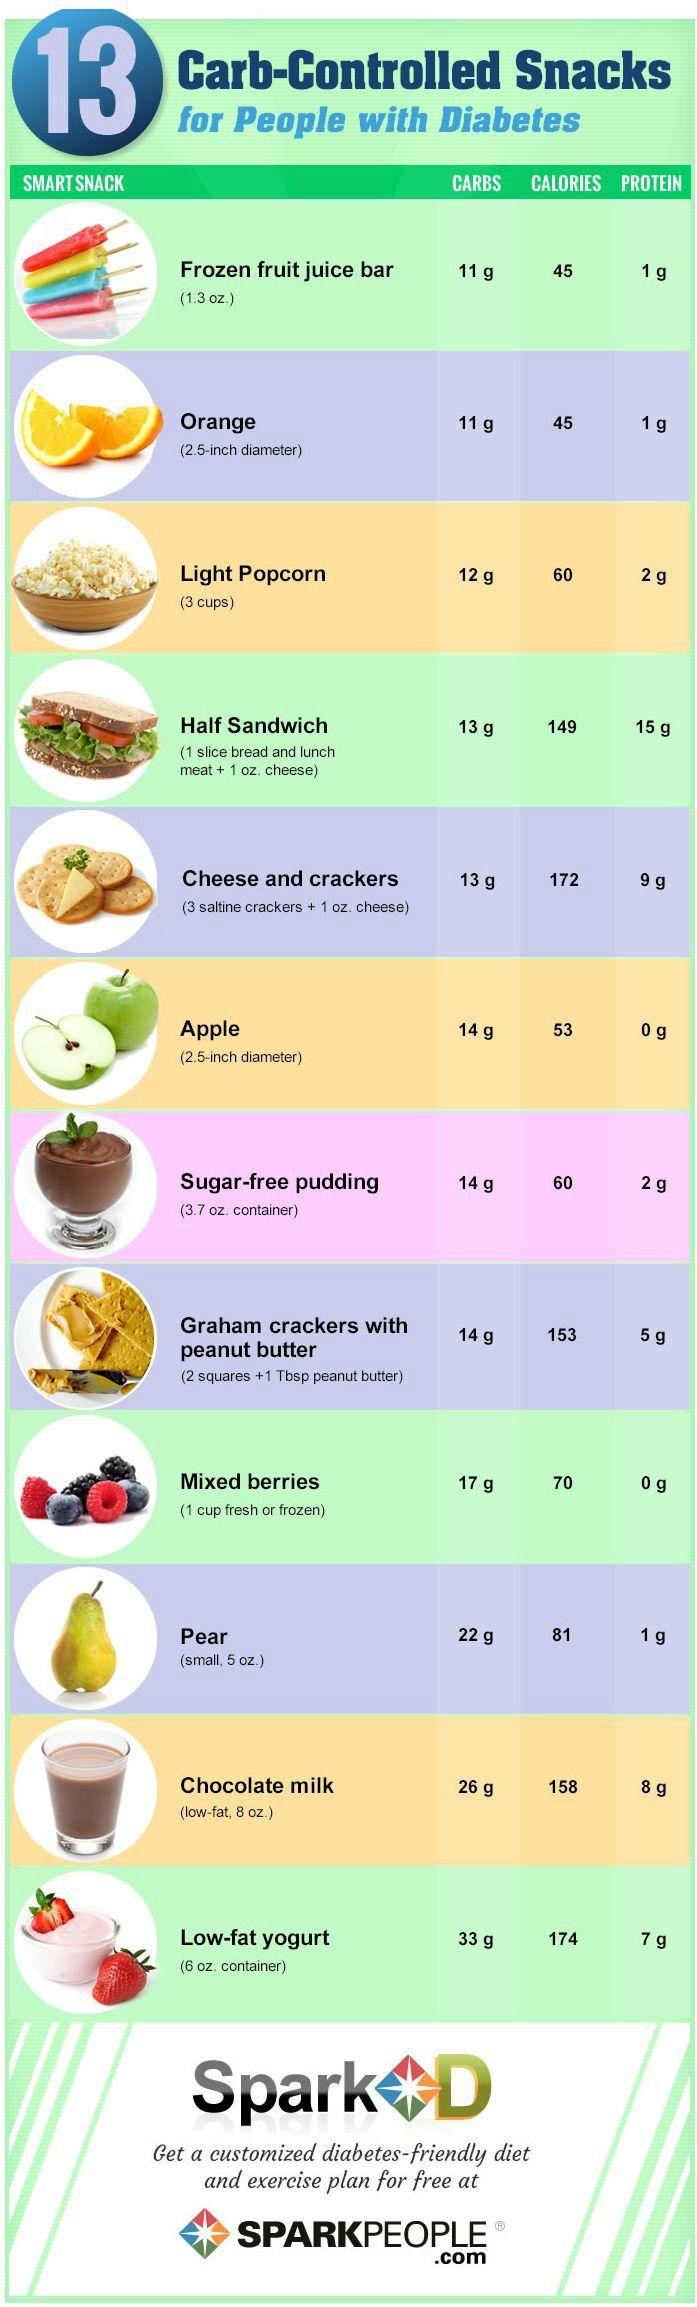 13 Carb Controlled Snacks Diabetic Snacks Diabetic Cooking Diabetic Tips